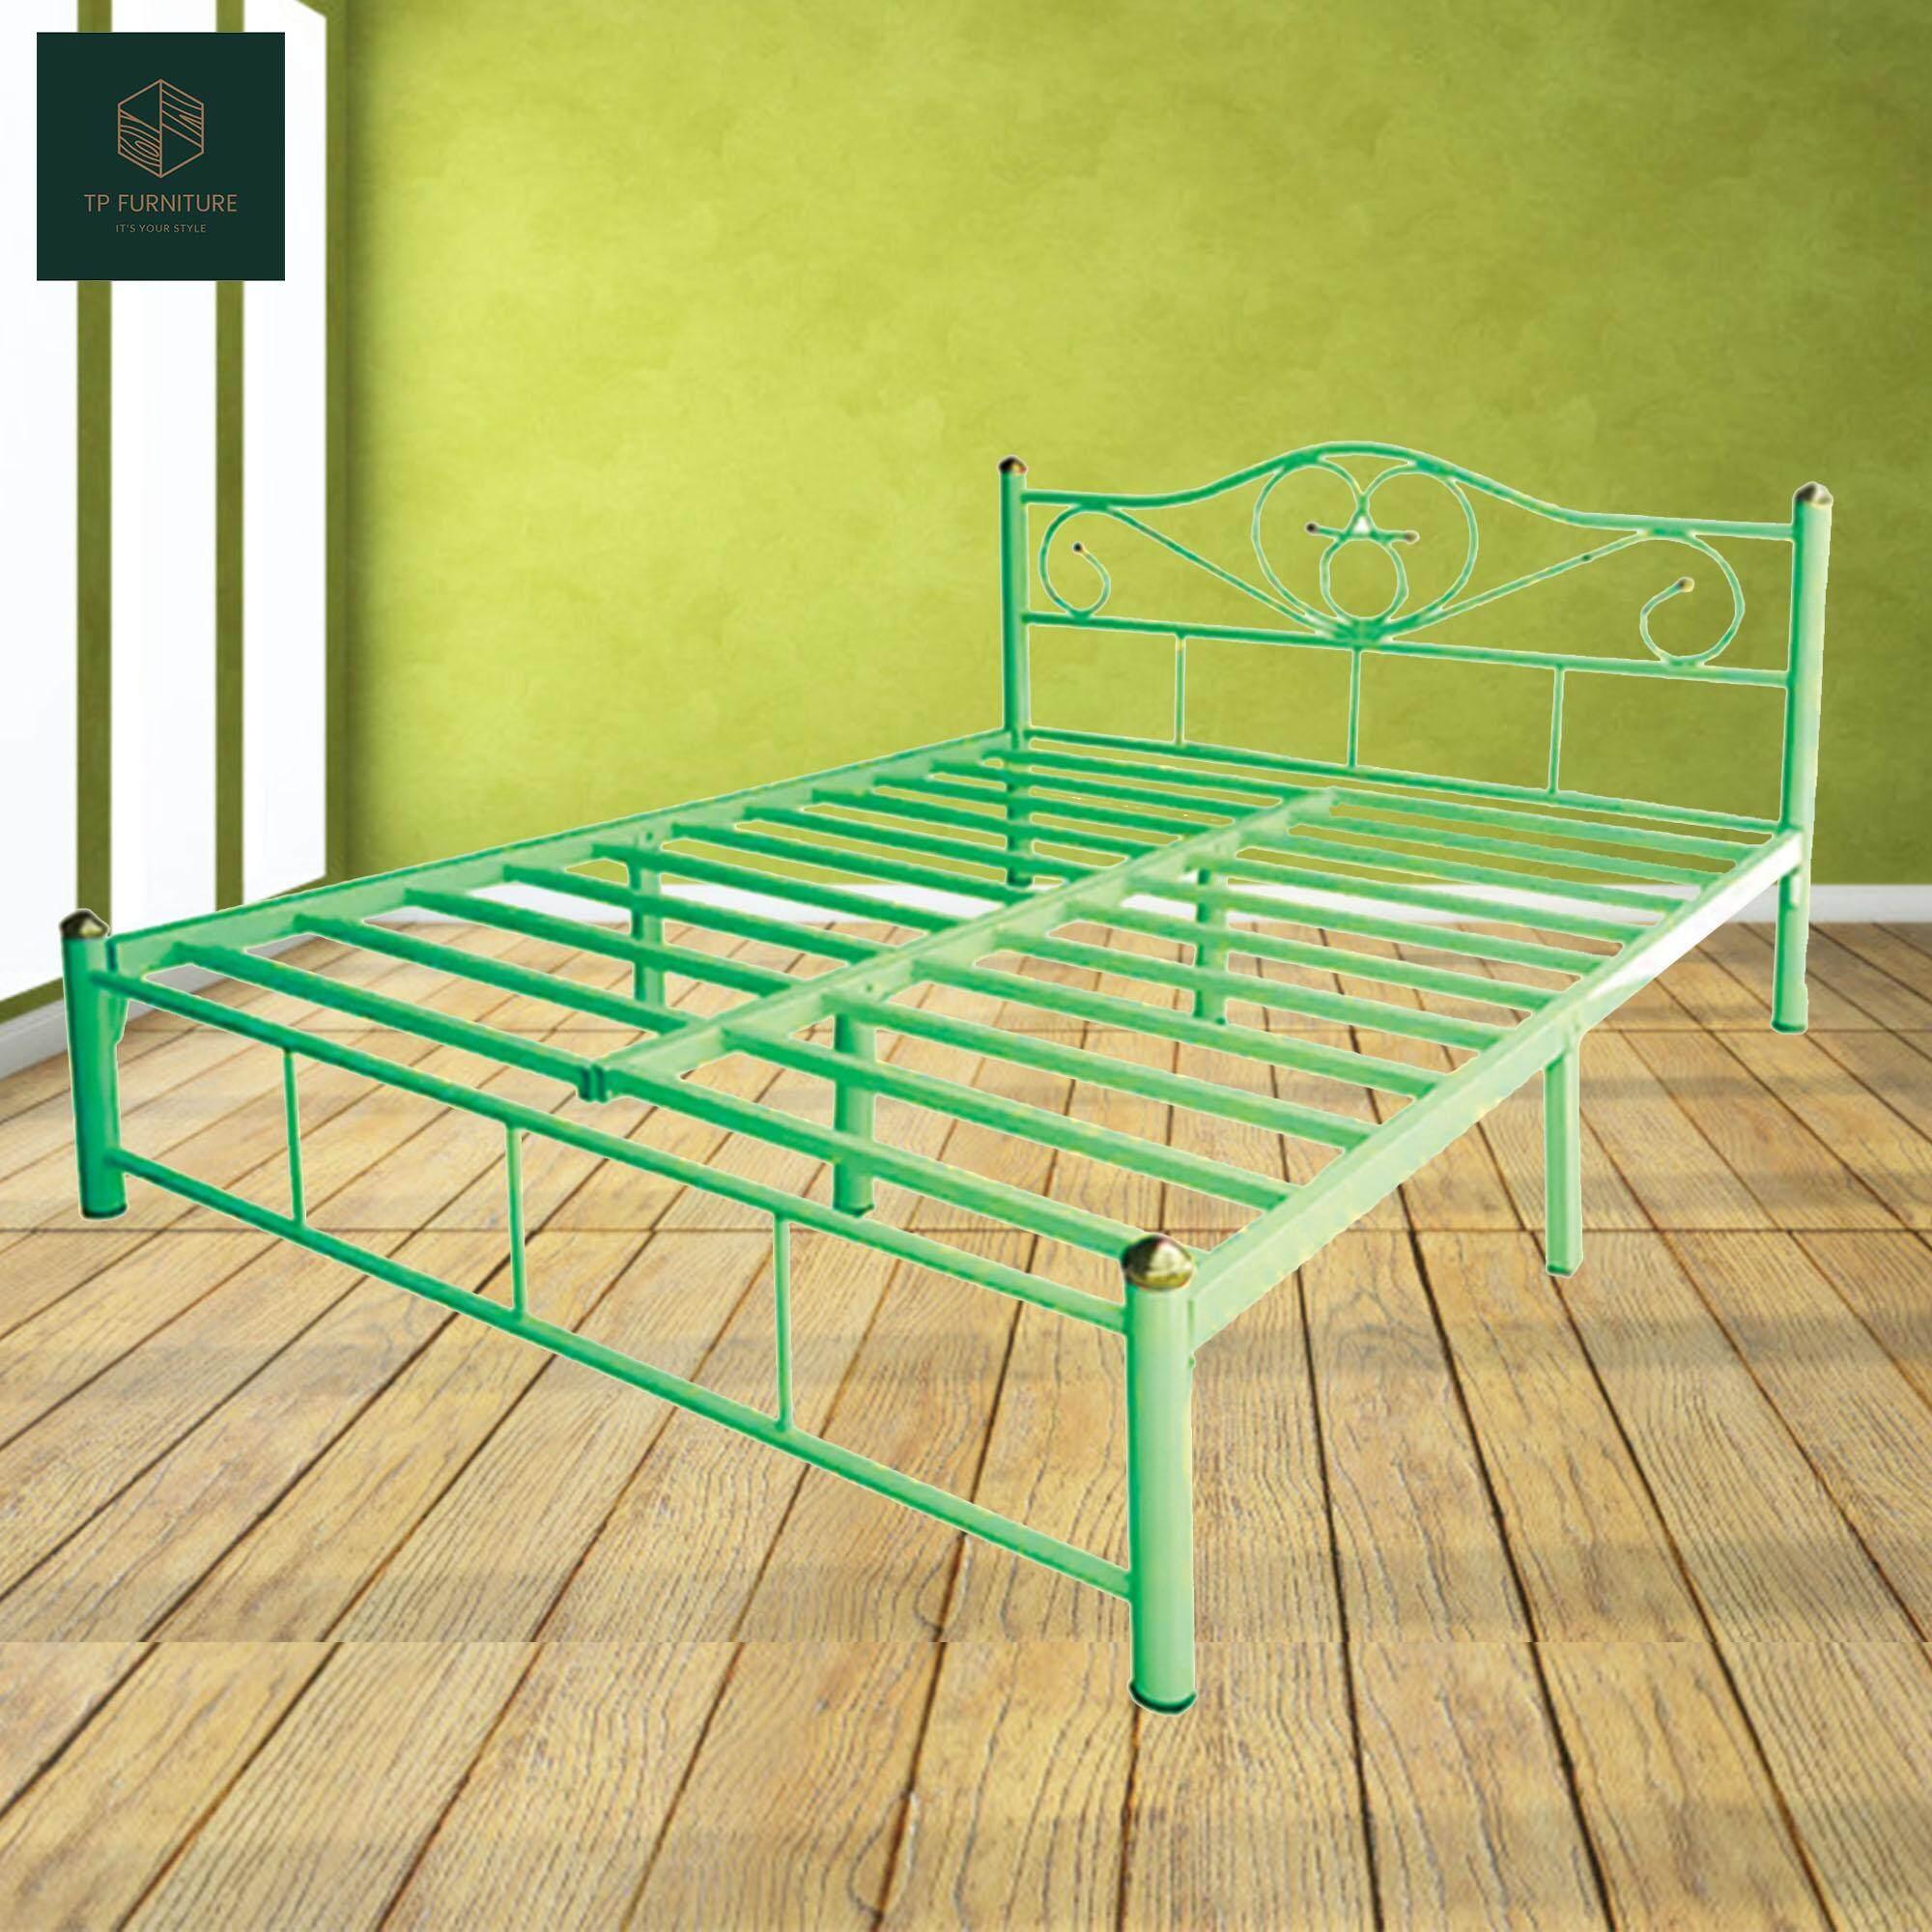 Otp เตียงเหล็ก 6ฟุต ขา2นิ้ว รุ่นโลตัส By Tp Furniture.